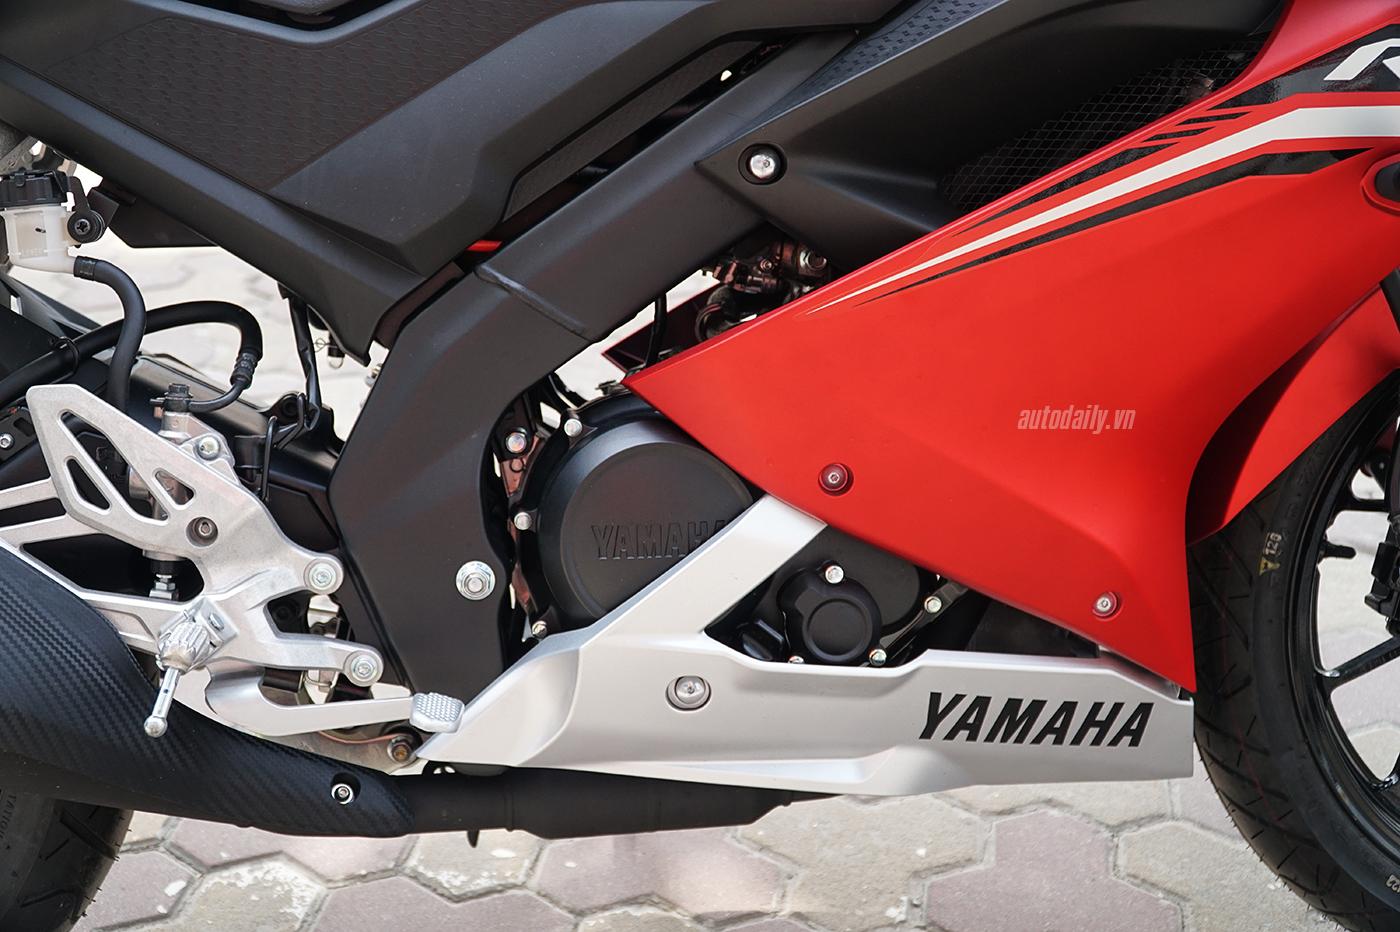 yamaha-r15-2017-16.jpg